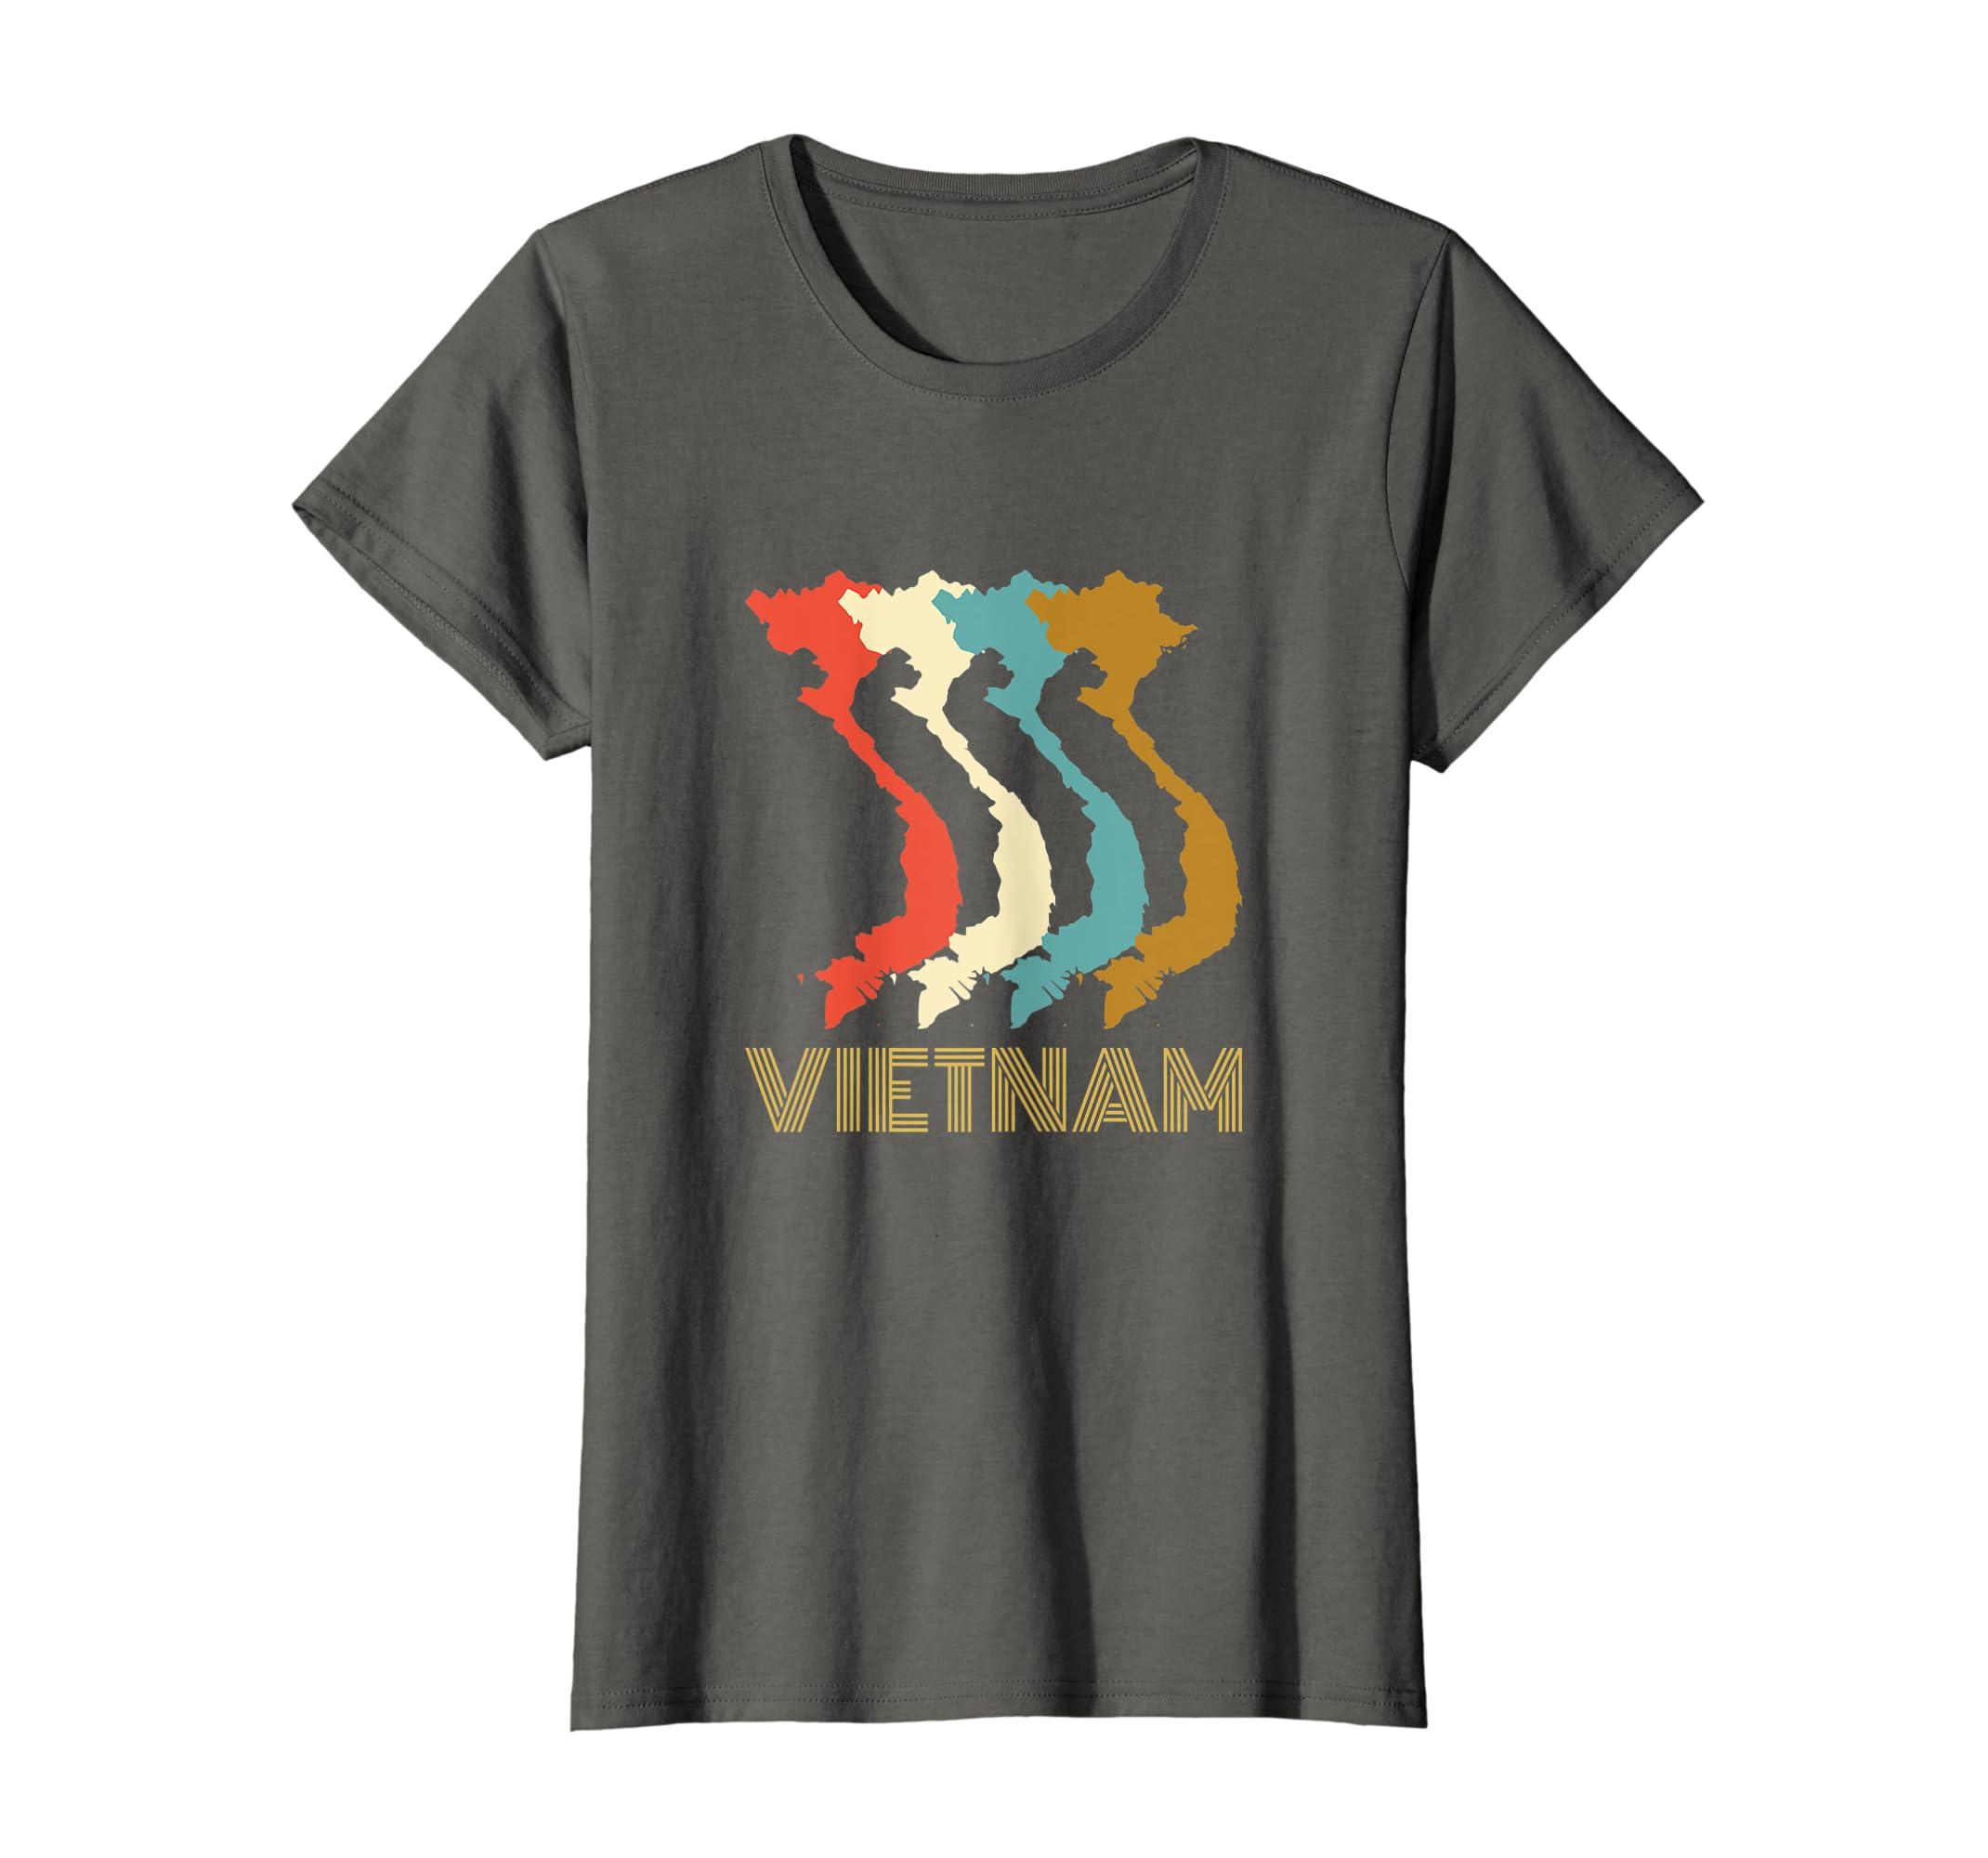 Amazon Com Vintage Vietnam T Shirt I Love Vietnam Map Shirt Clothing